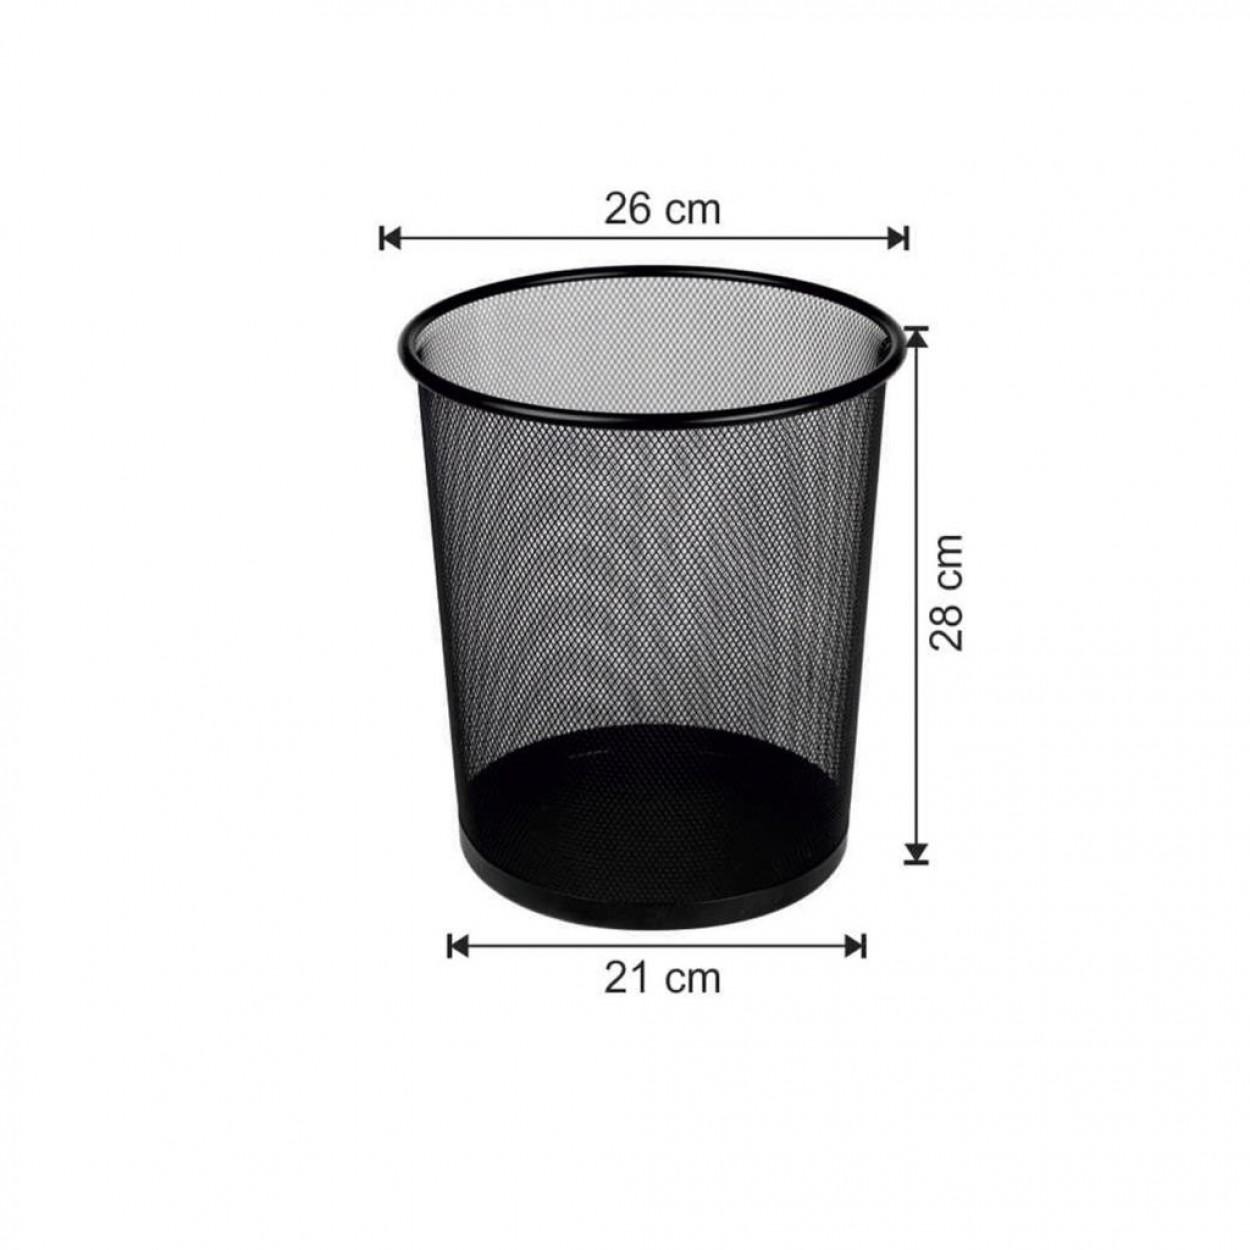 Ofis Tipi Çöp Kovası Konik Tip Fileli 12 Litre